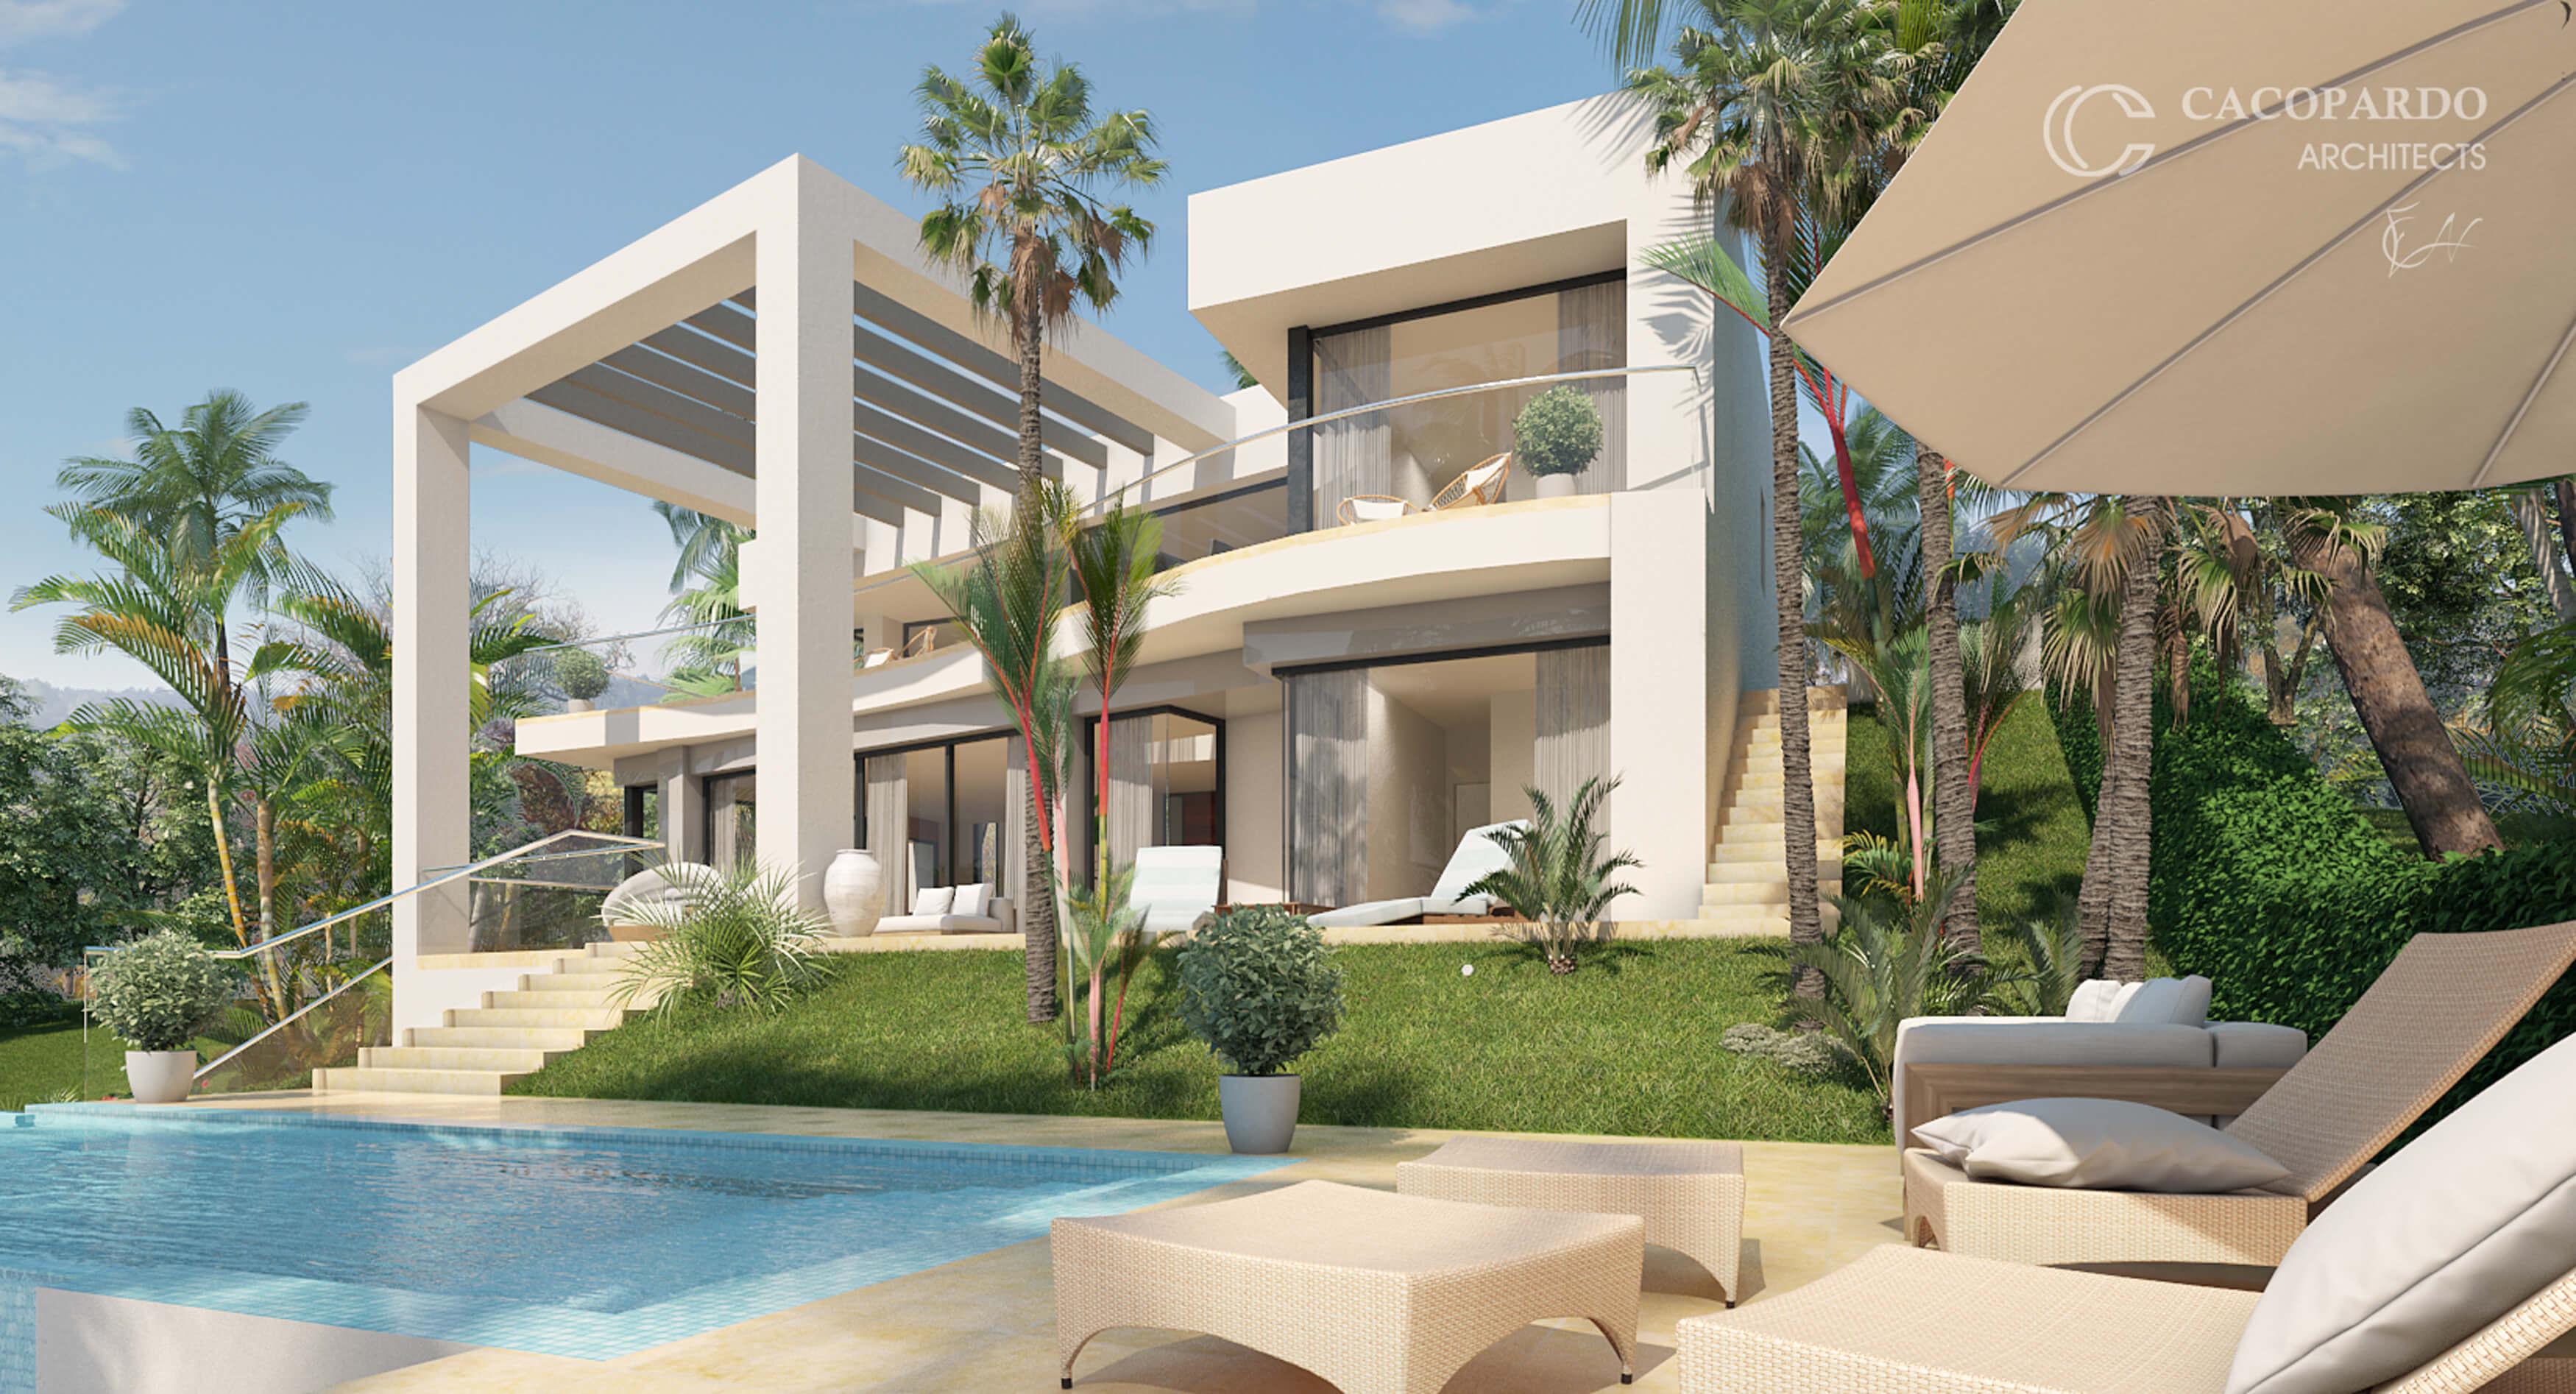 The Barlow House - Cacopardo Arquitectos